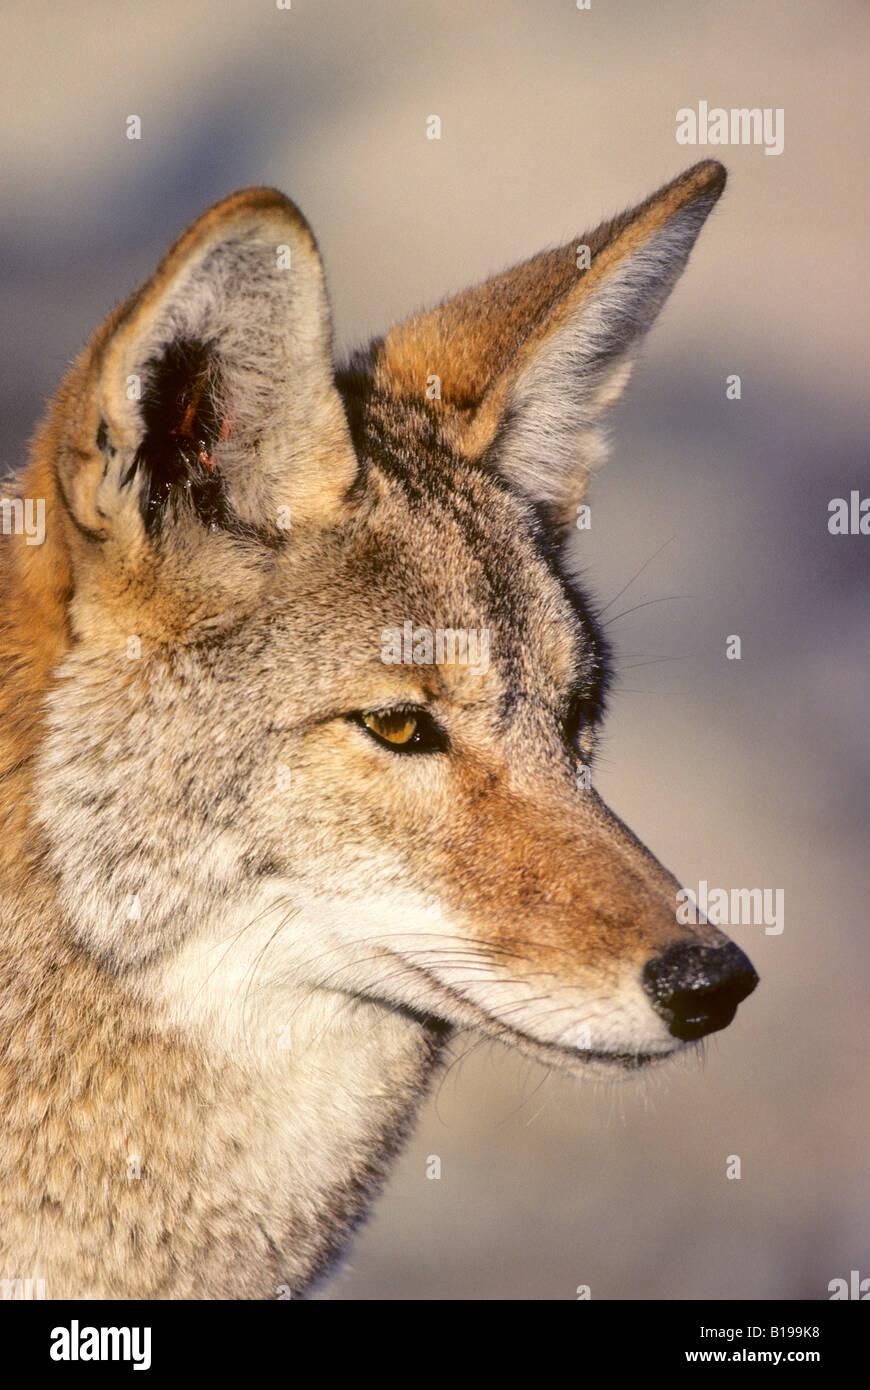 Adult coyote (Canis latrans), Mojave Desert, California, USA - Stock Image